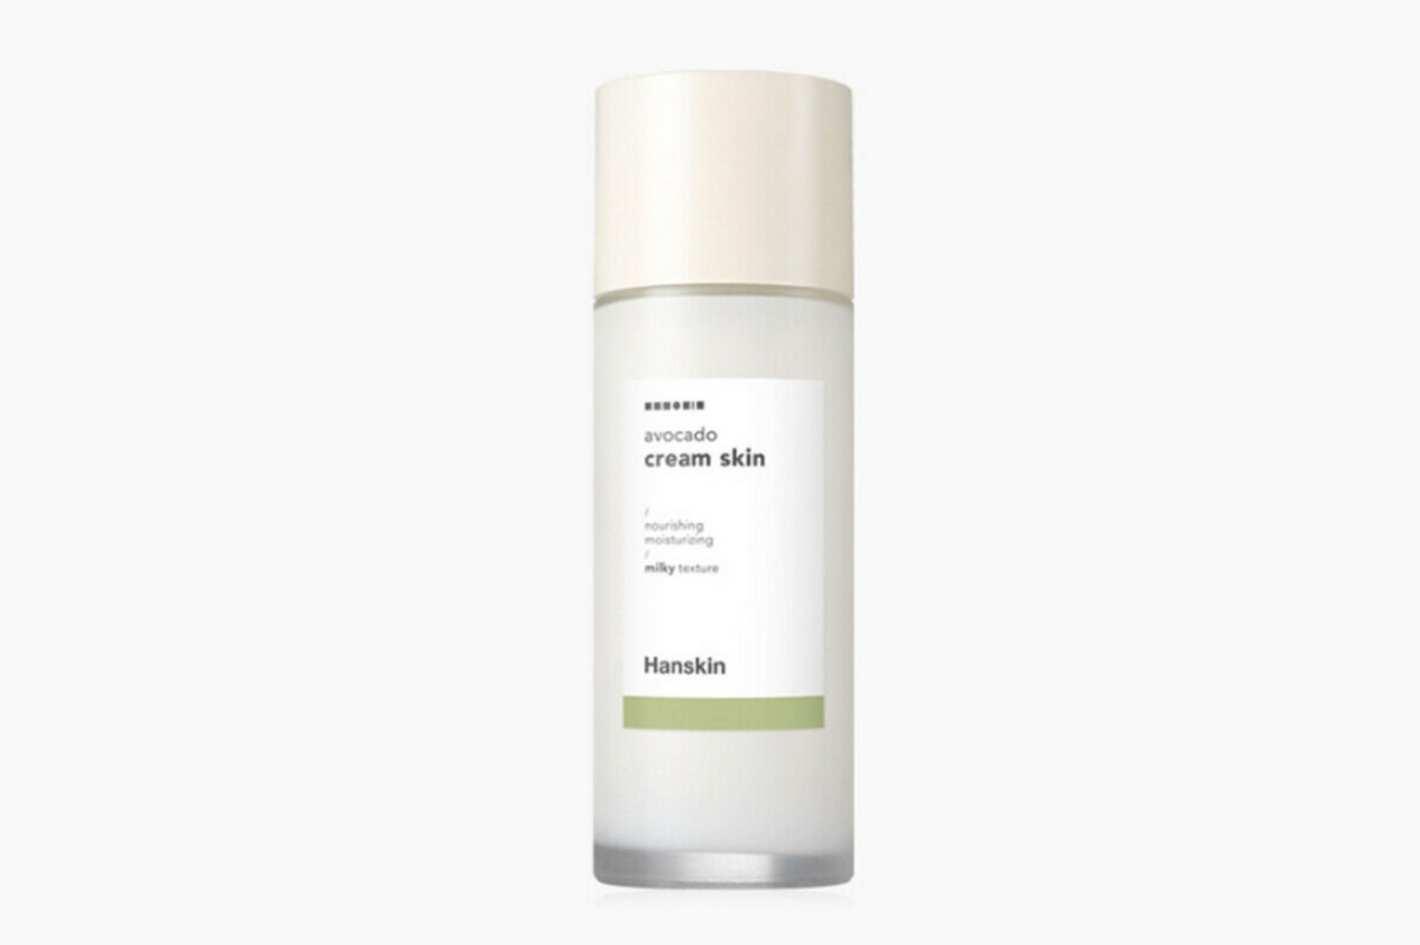 'HANSKIN' Avocado Cream Skin Toner and Moisturizer